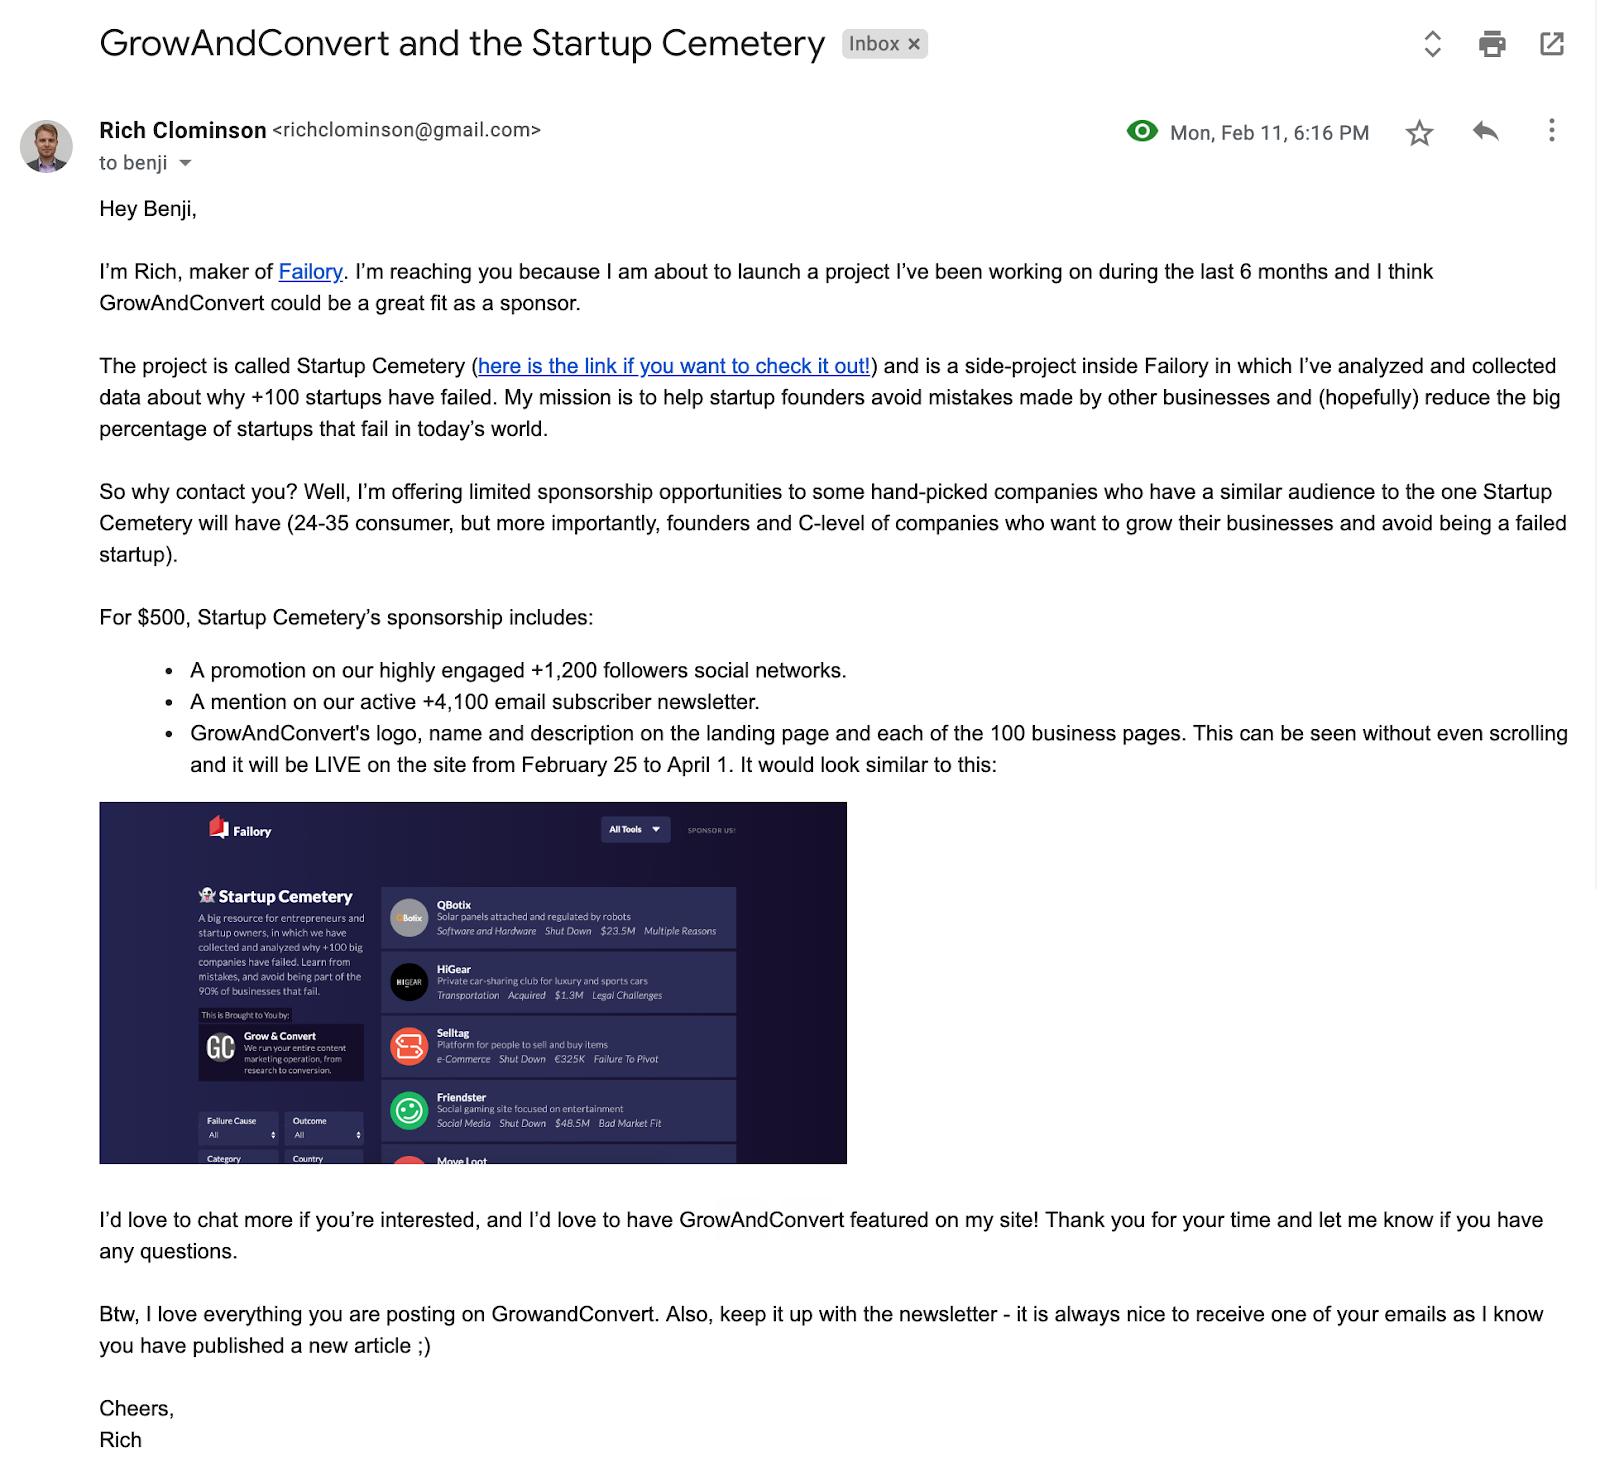 February 2019 - Sponsors Email